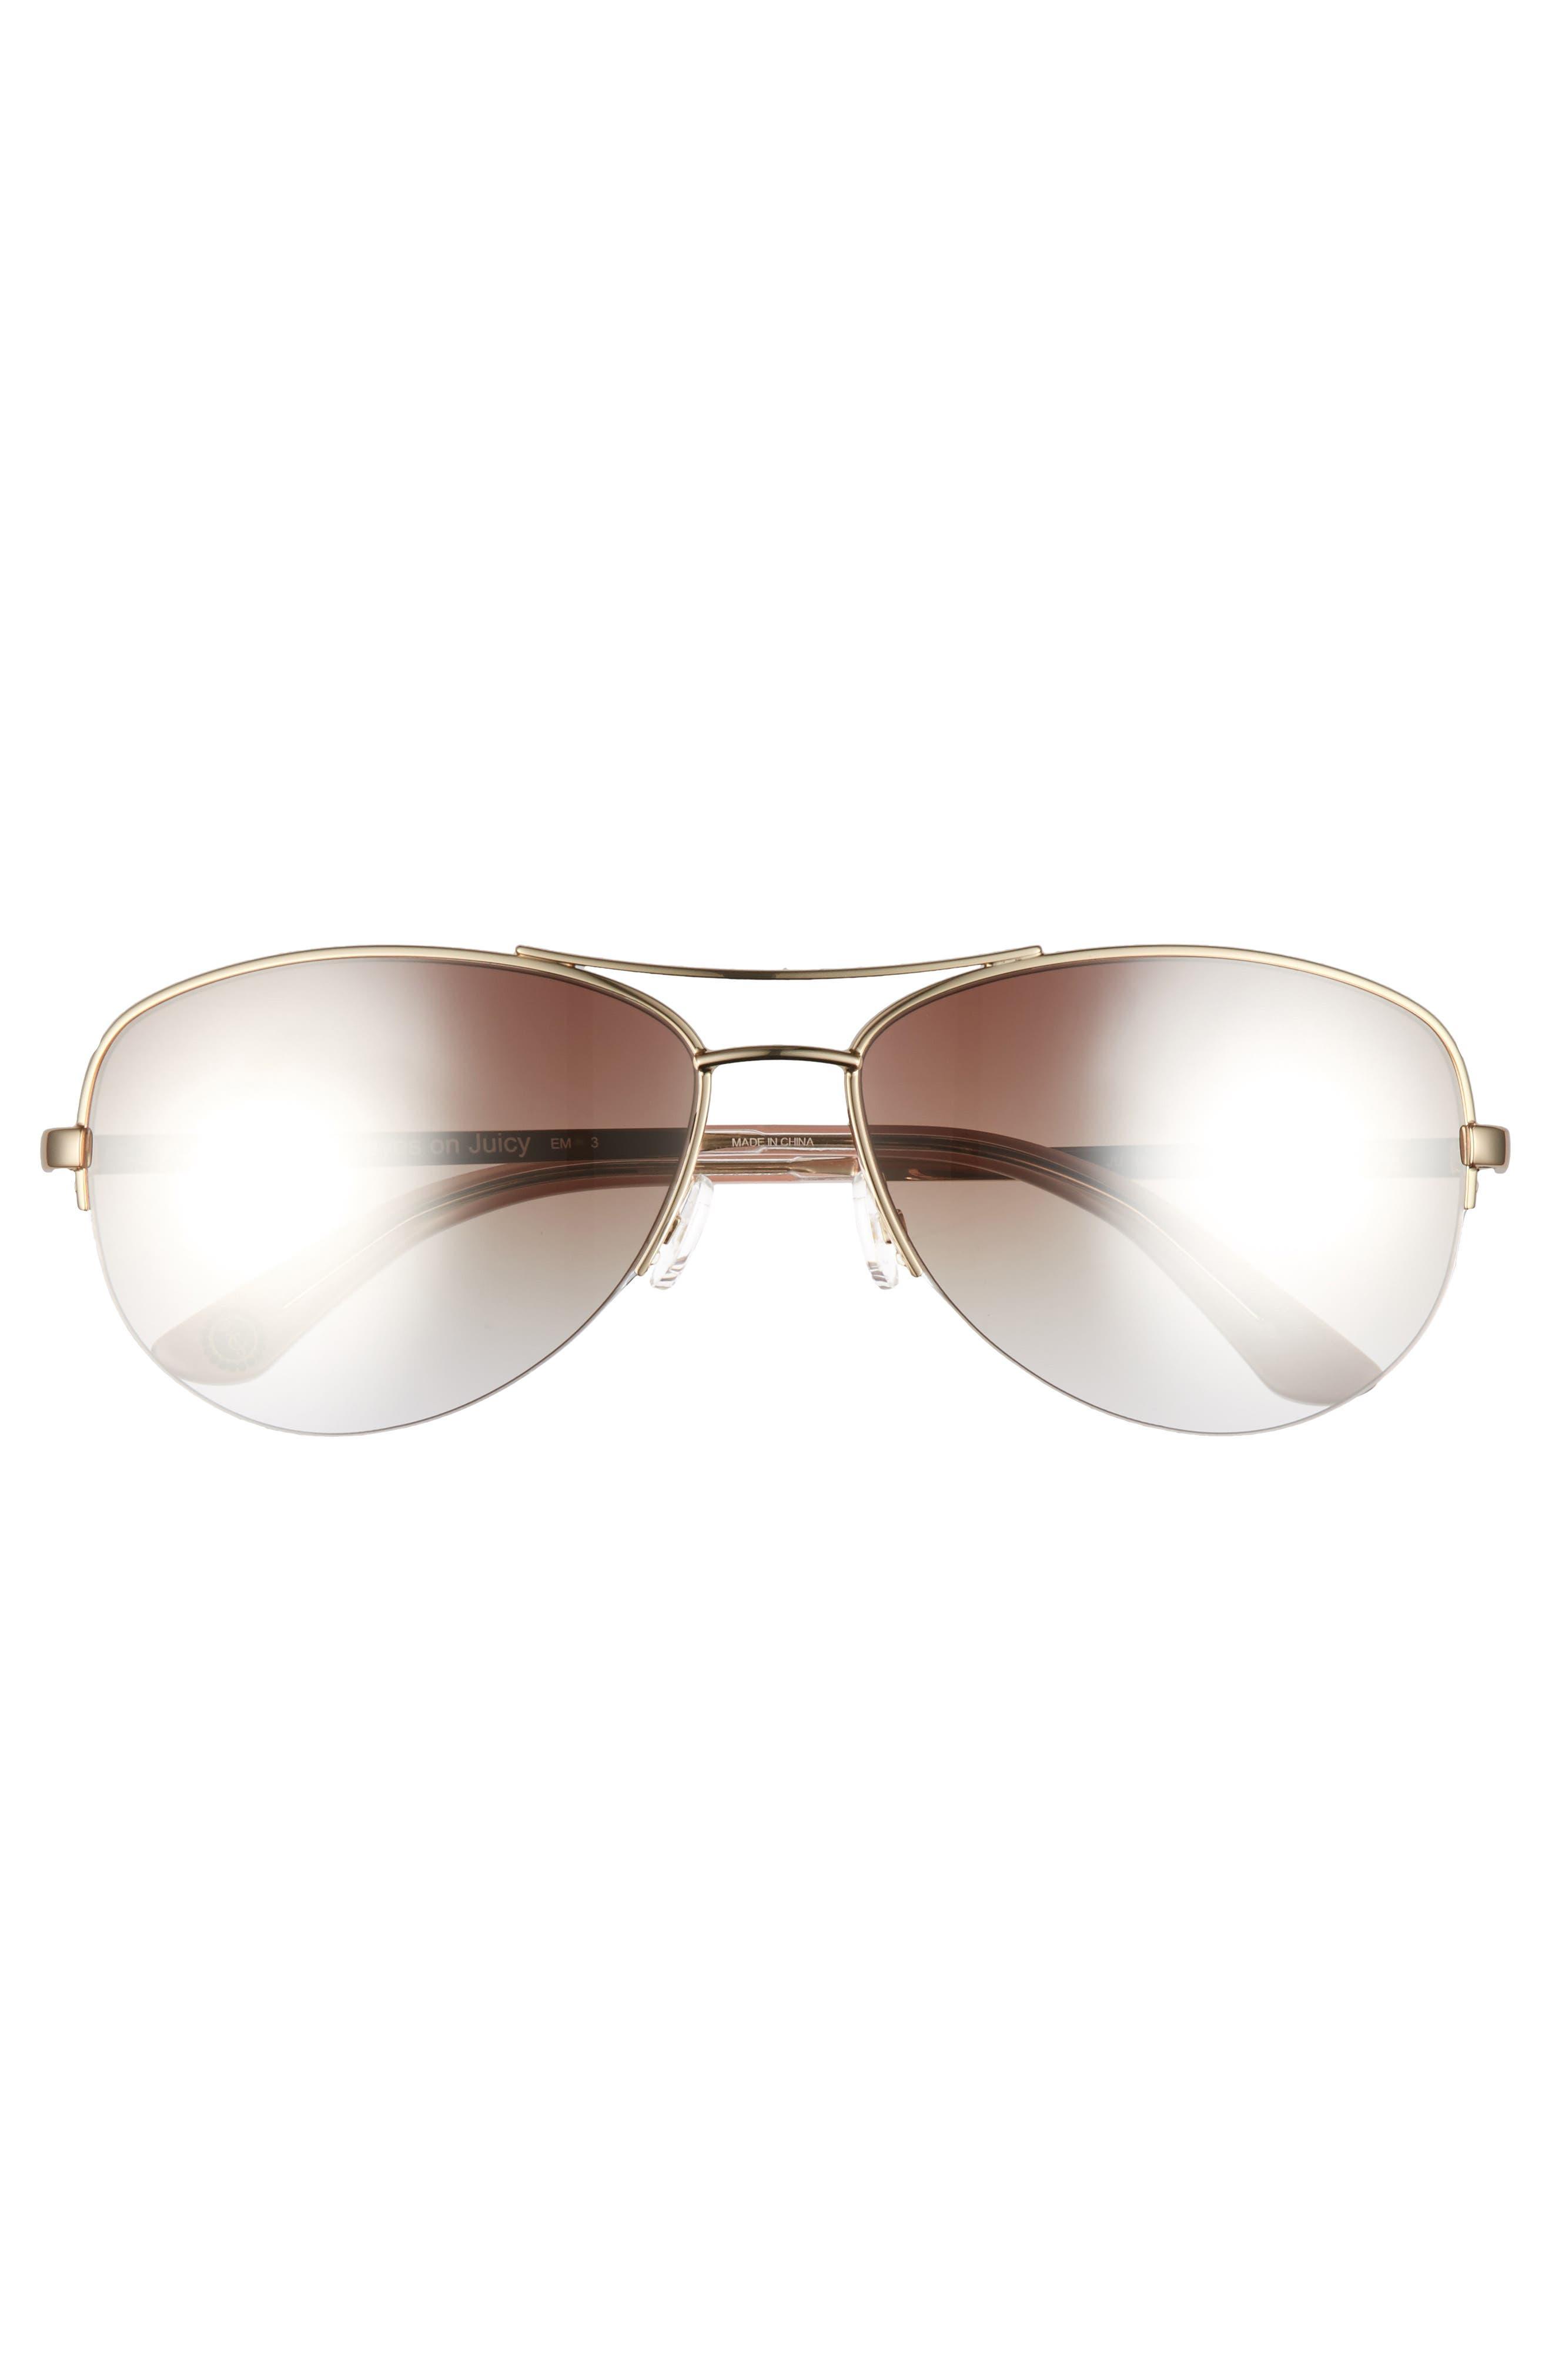 Black Label 60mm Gradient Aviator Sunglasses,                             Alternate thumbnail 3, color,                             Light Gold